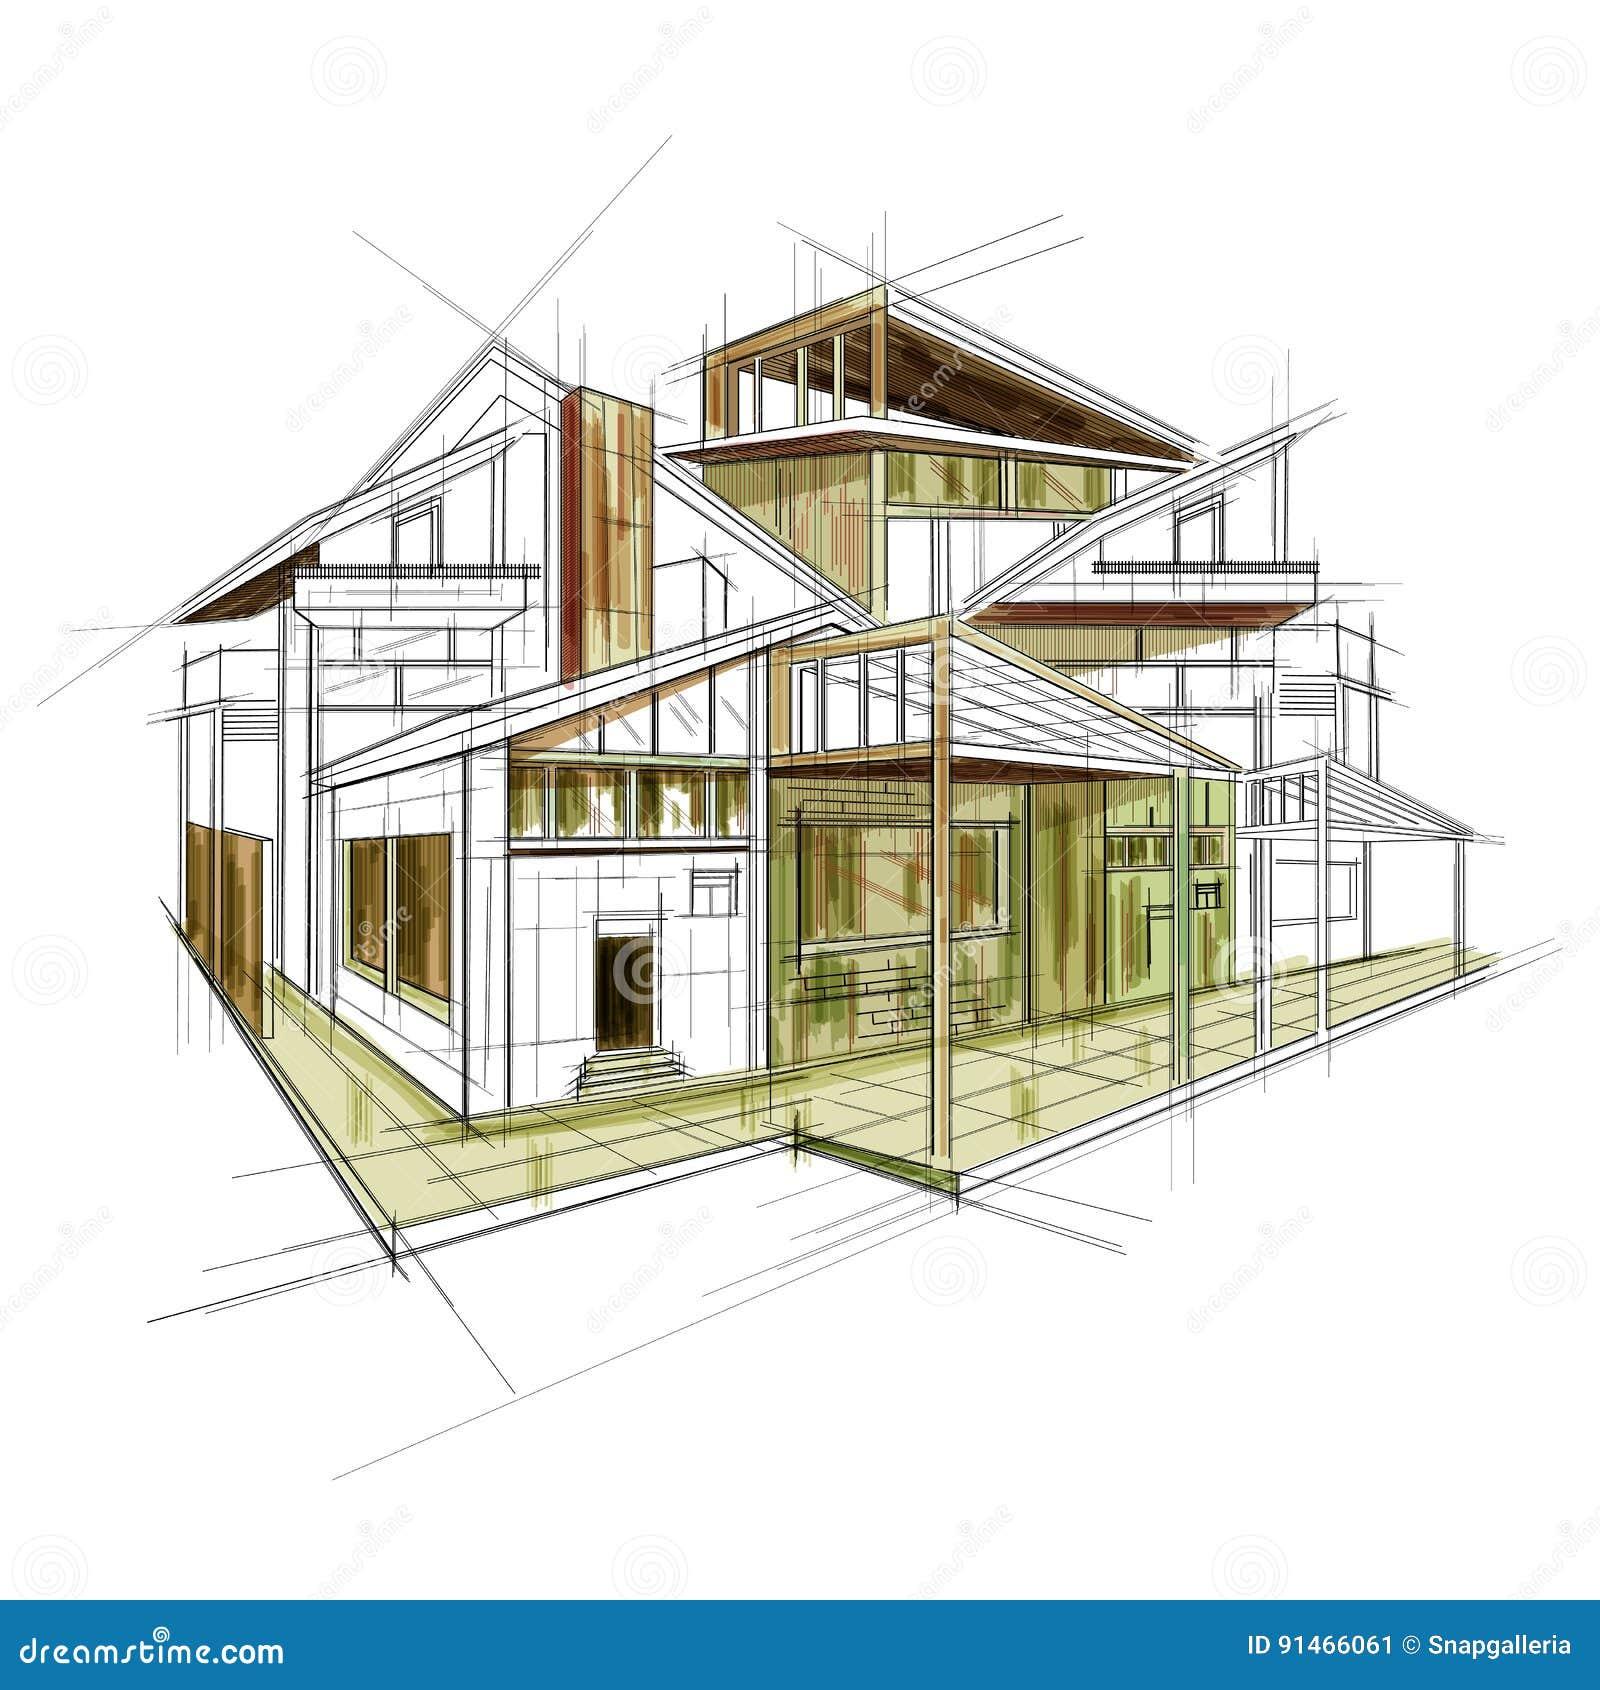 Sketch of exterior building draft blueprint design stock vector download sketch of exterior building draft blueprint design stock vector illustration of engineering blueprint malvernweather Images